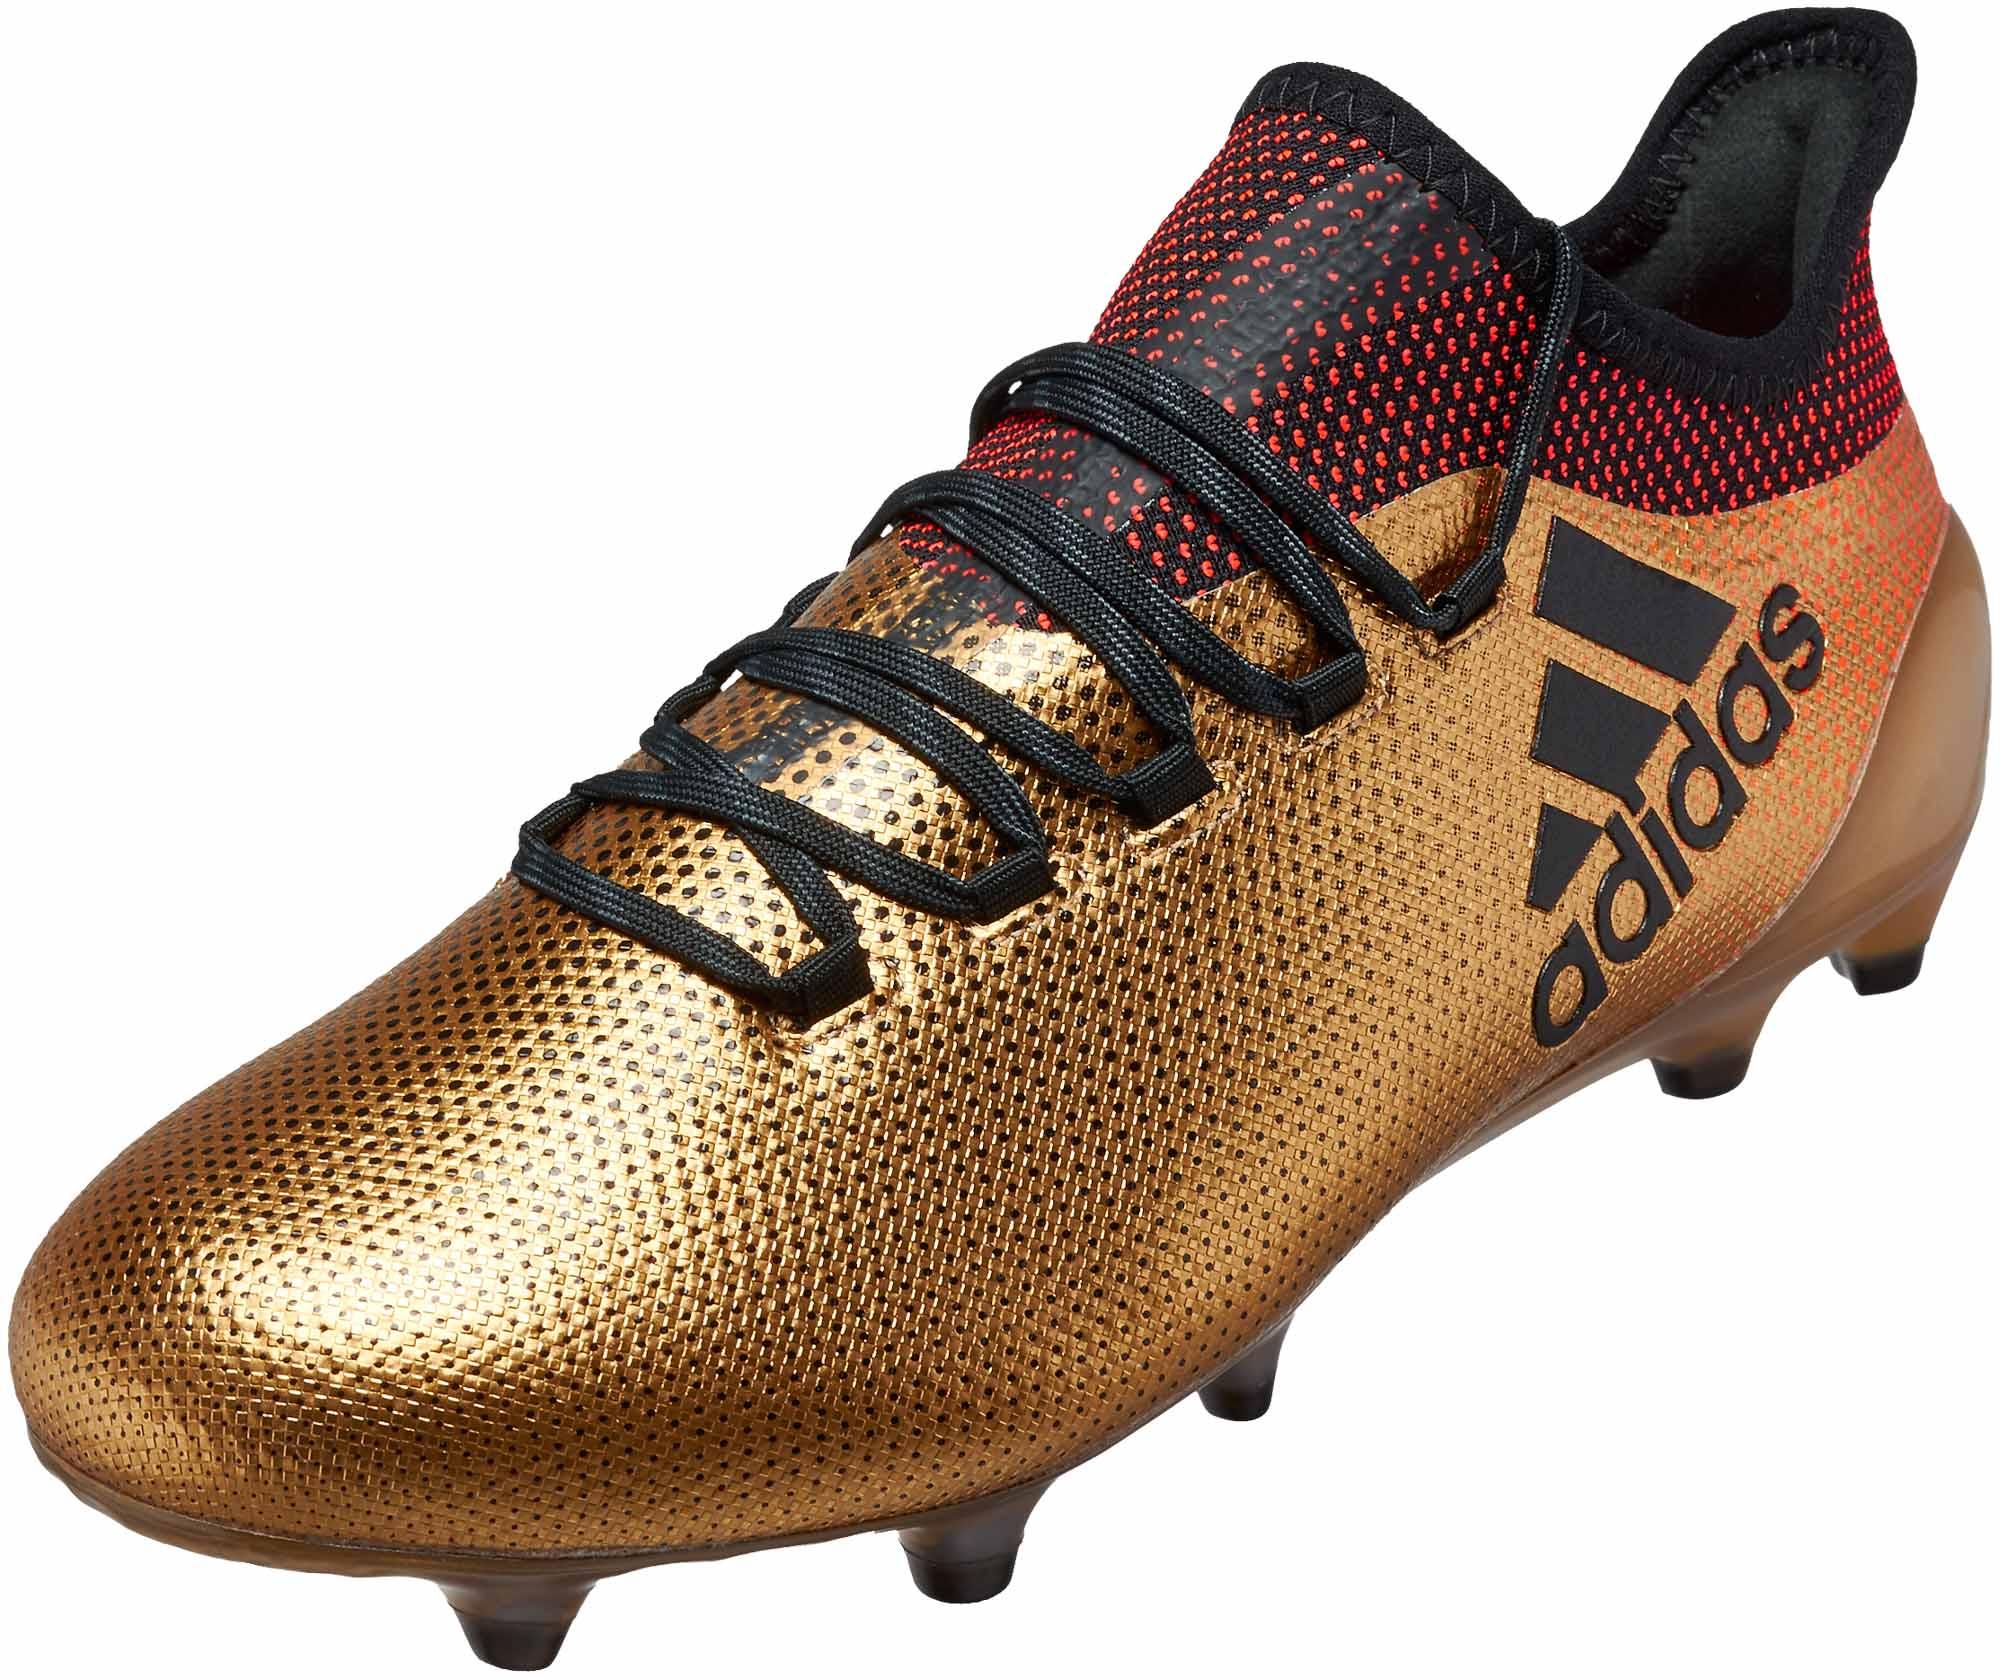 timeless design 1c25f 1450f adidas X 17.1 FG - Tactile Gold Metallic & Solar Red - Soccer ...